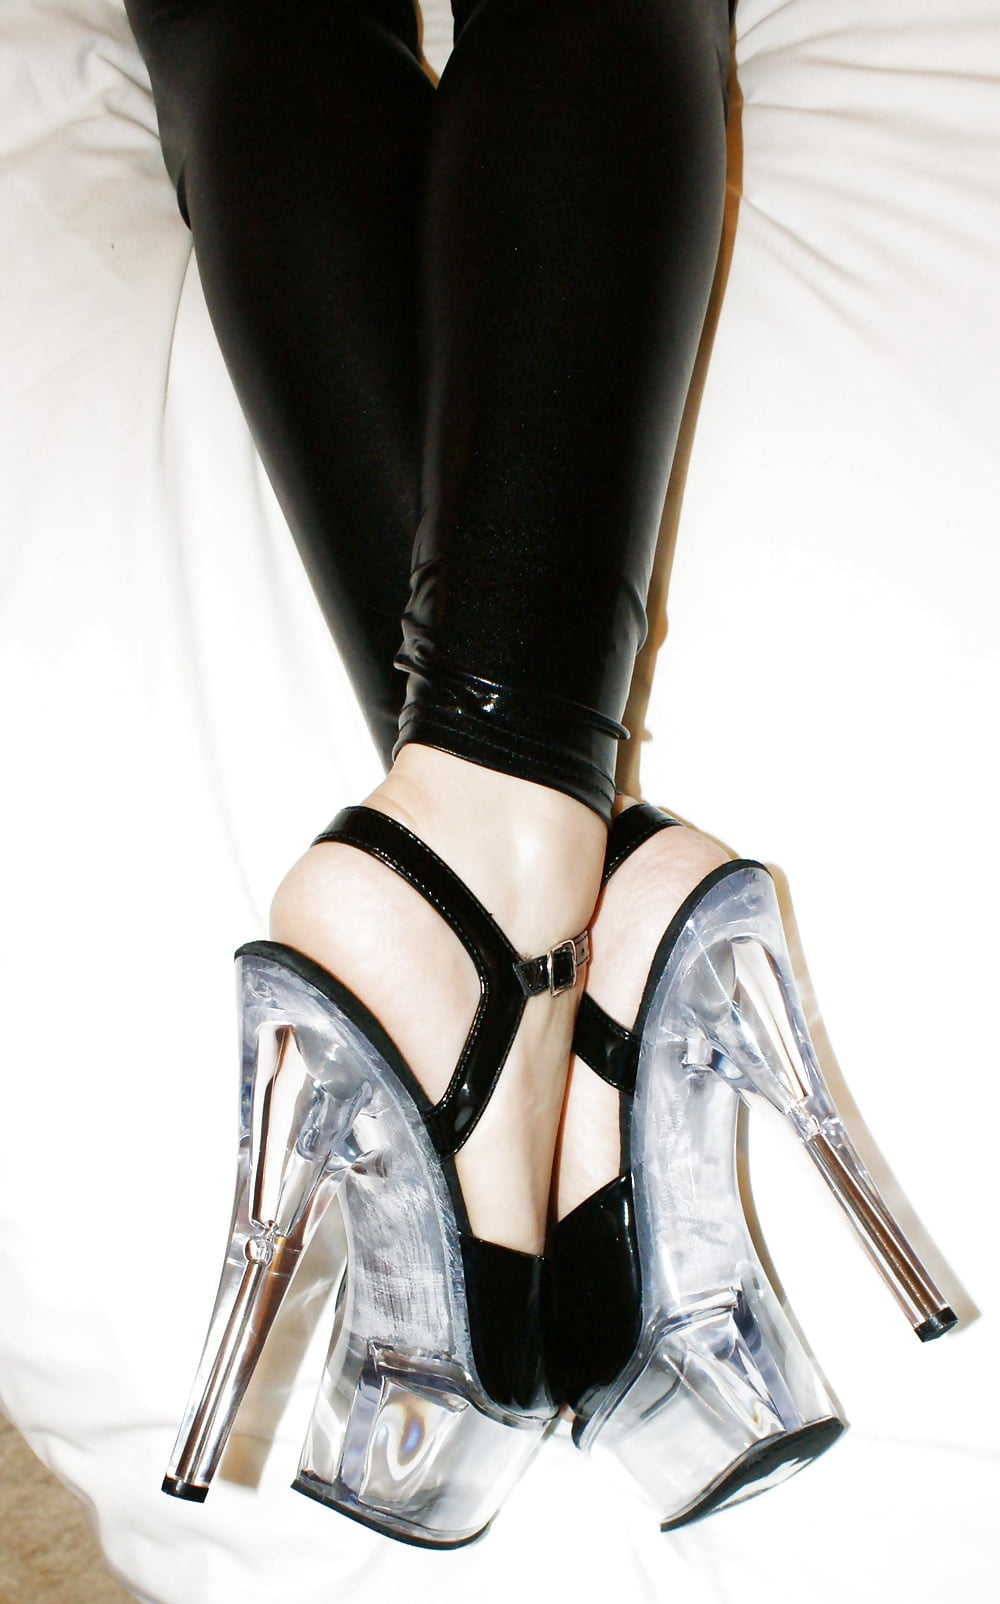 taboo-free-sluts-in-heel